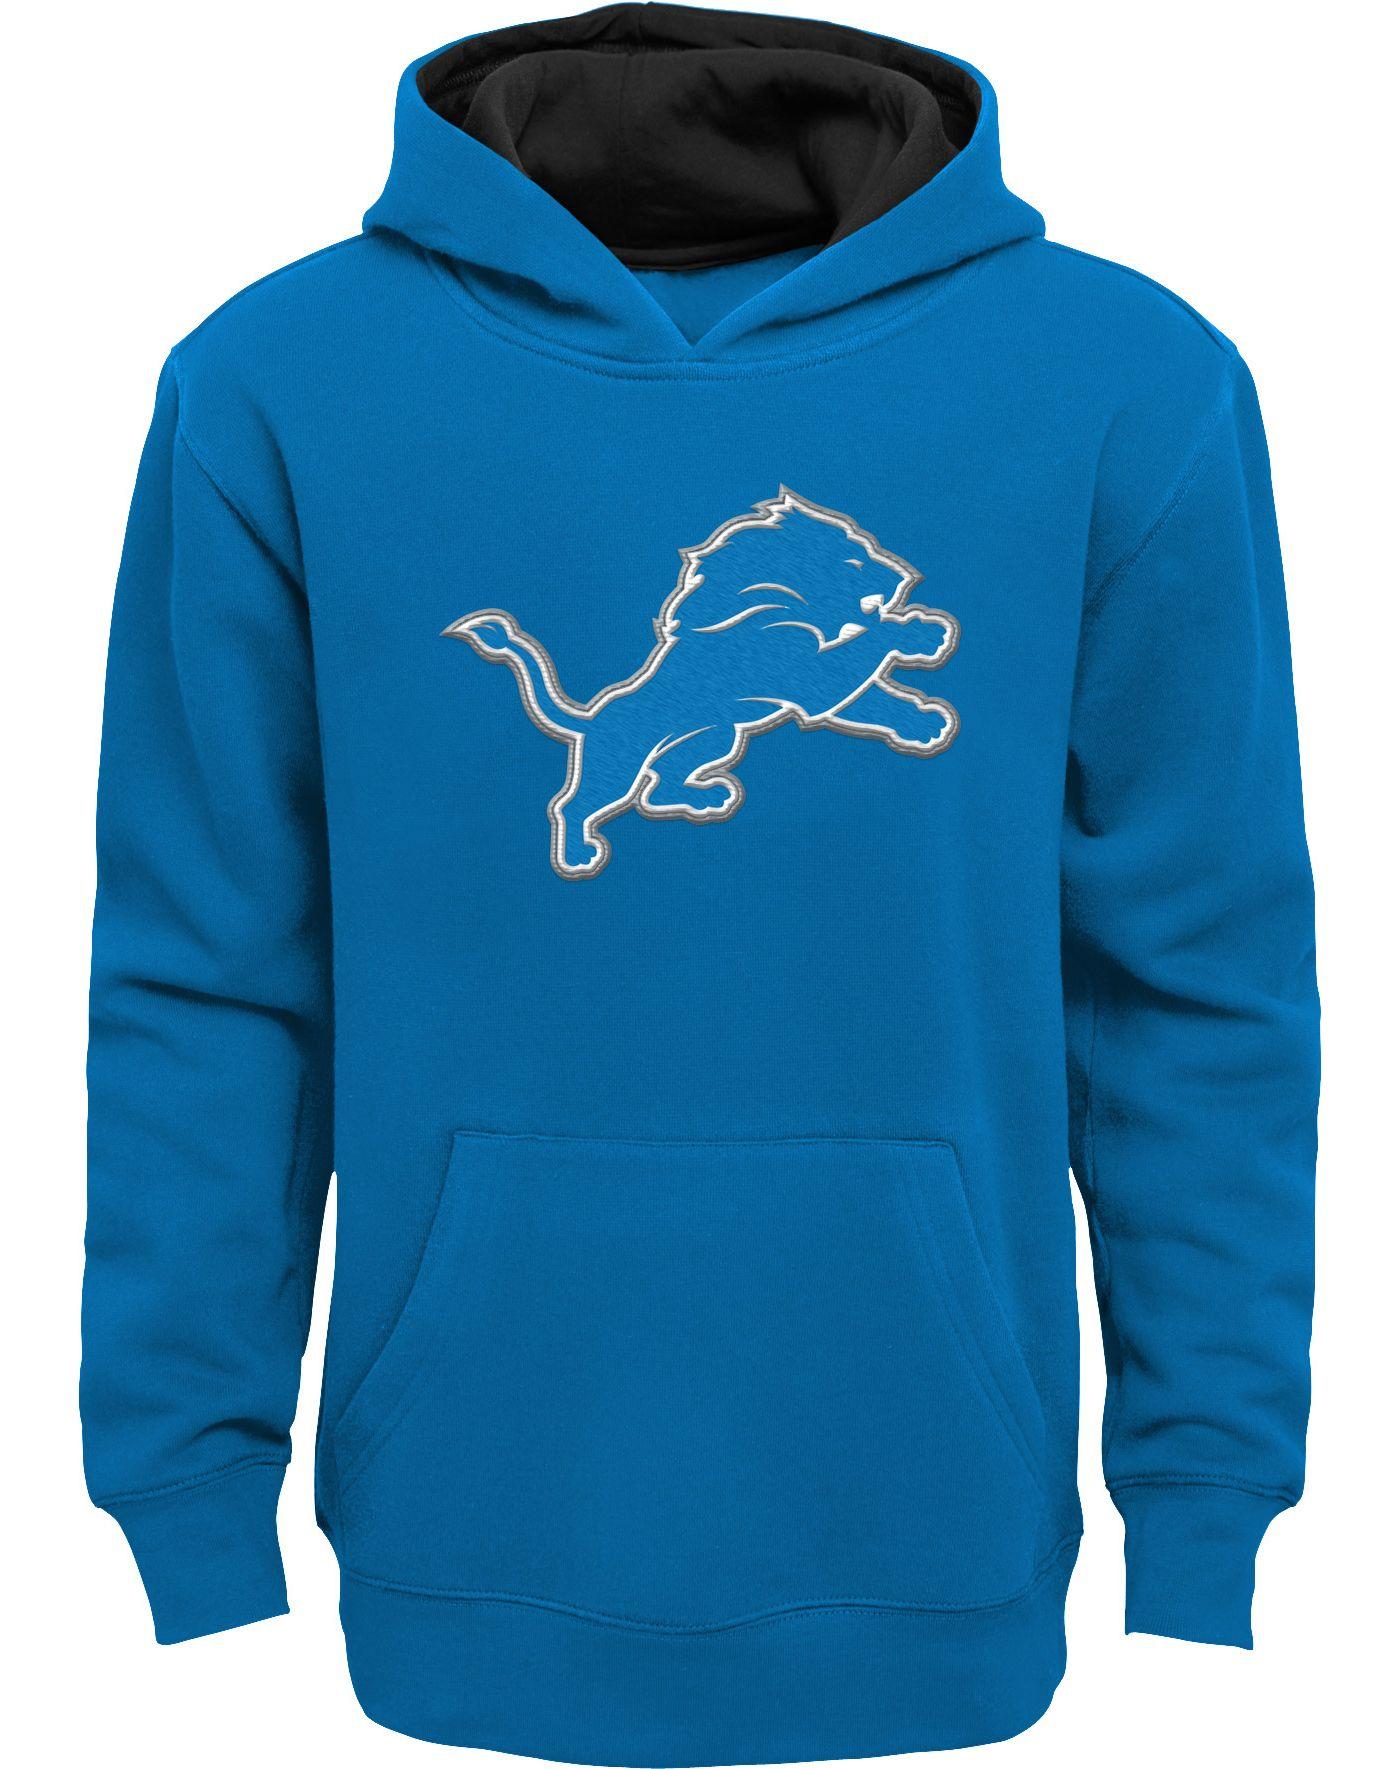 NFL Team Apparel Boys' Detroit Lions Prime Blue Pullover Hoodie